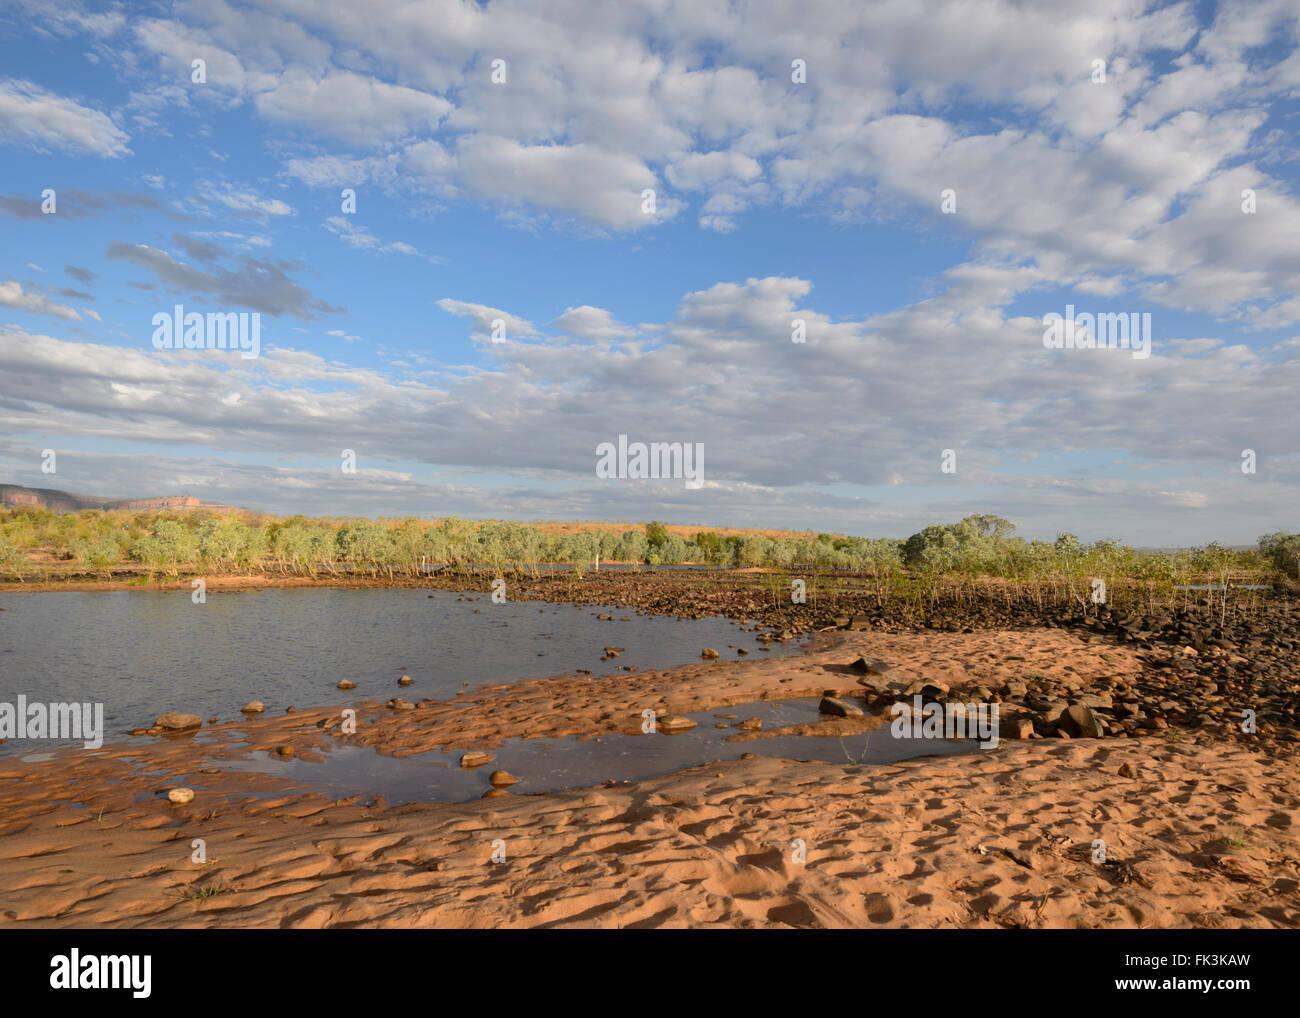 Pentecost Crossing, The Kimberley, Western Australia, WA, Australia - Stock Image